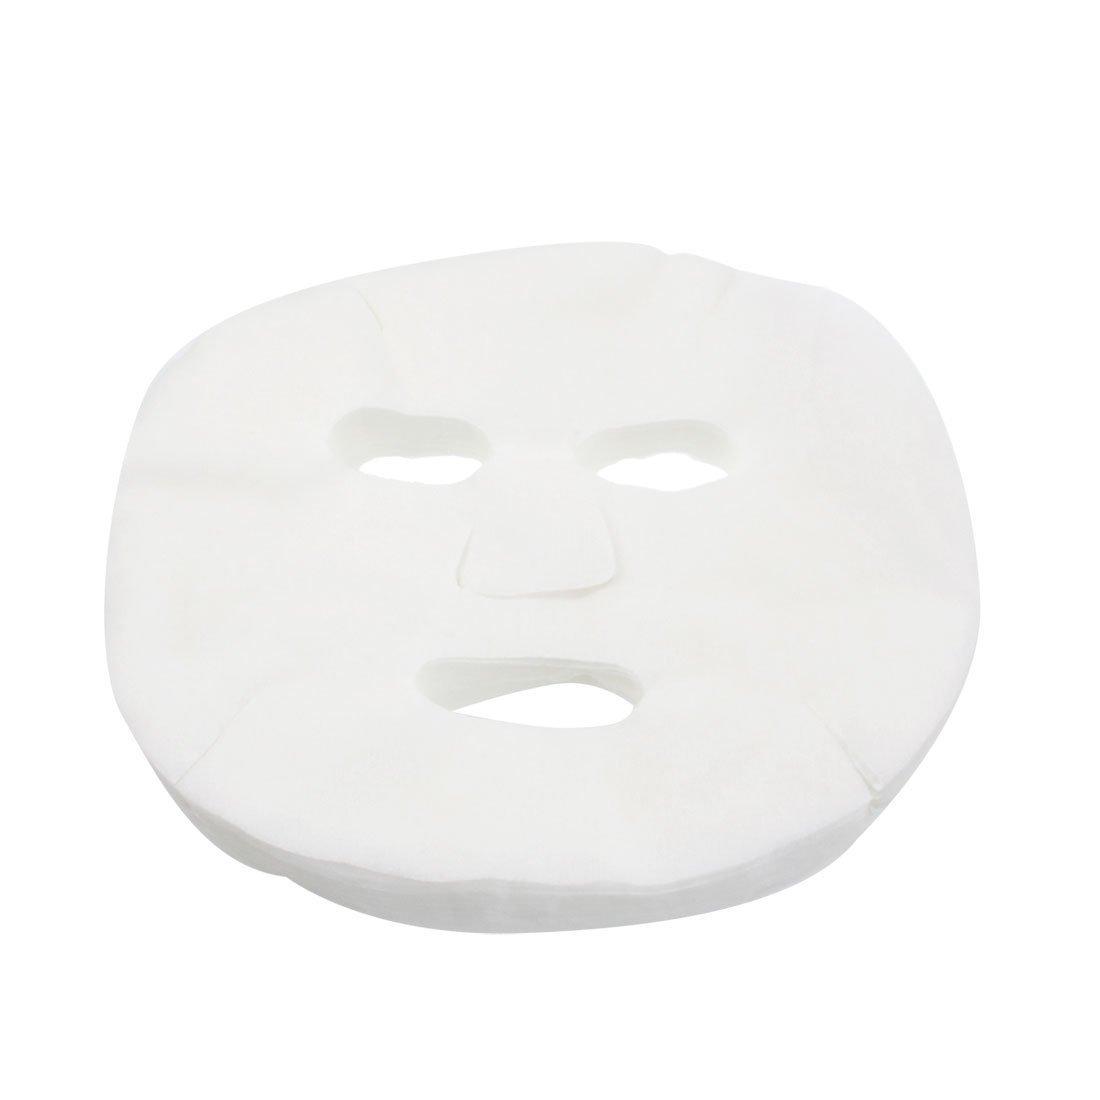 GBSTORE 100 Pcs DIY White Color Natural Spa Skin Care Skin Fiber Paper Pre-cut Facial Paper Sheet Facial Mask